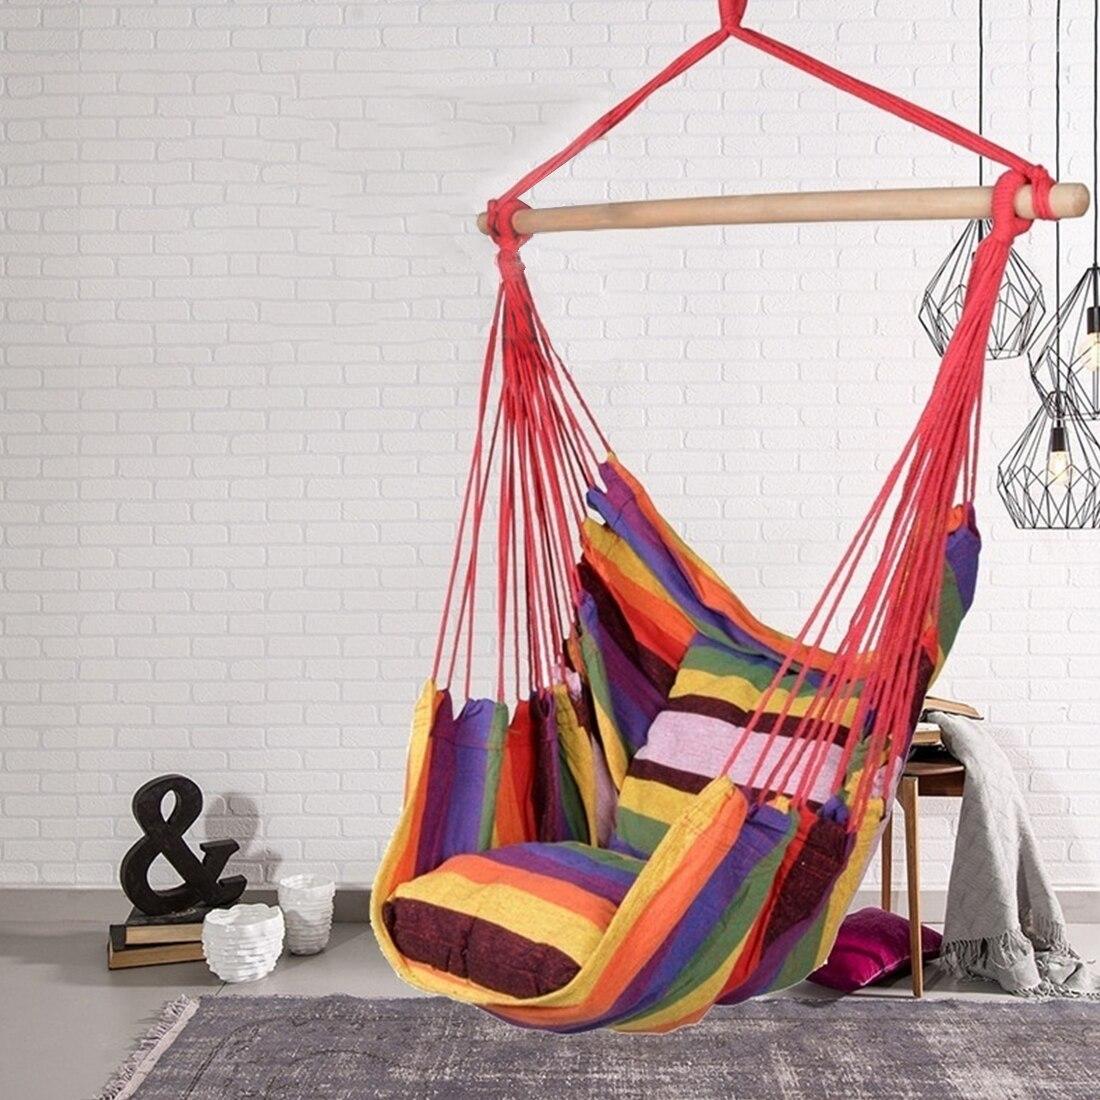 Outdoor Leisure Swing Chair Indoor Rocking Chair Hammock  Swing Chair Seat Travel Camping Hammock Garden Hang Chair Swinging